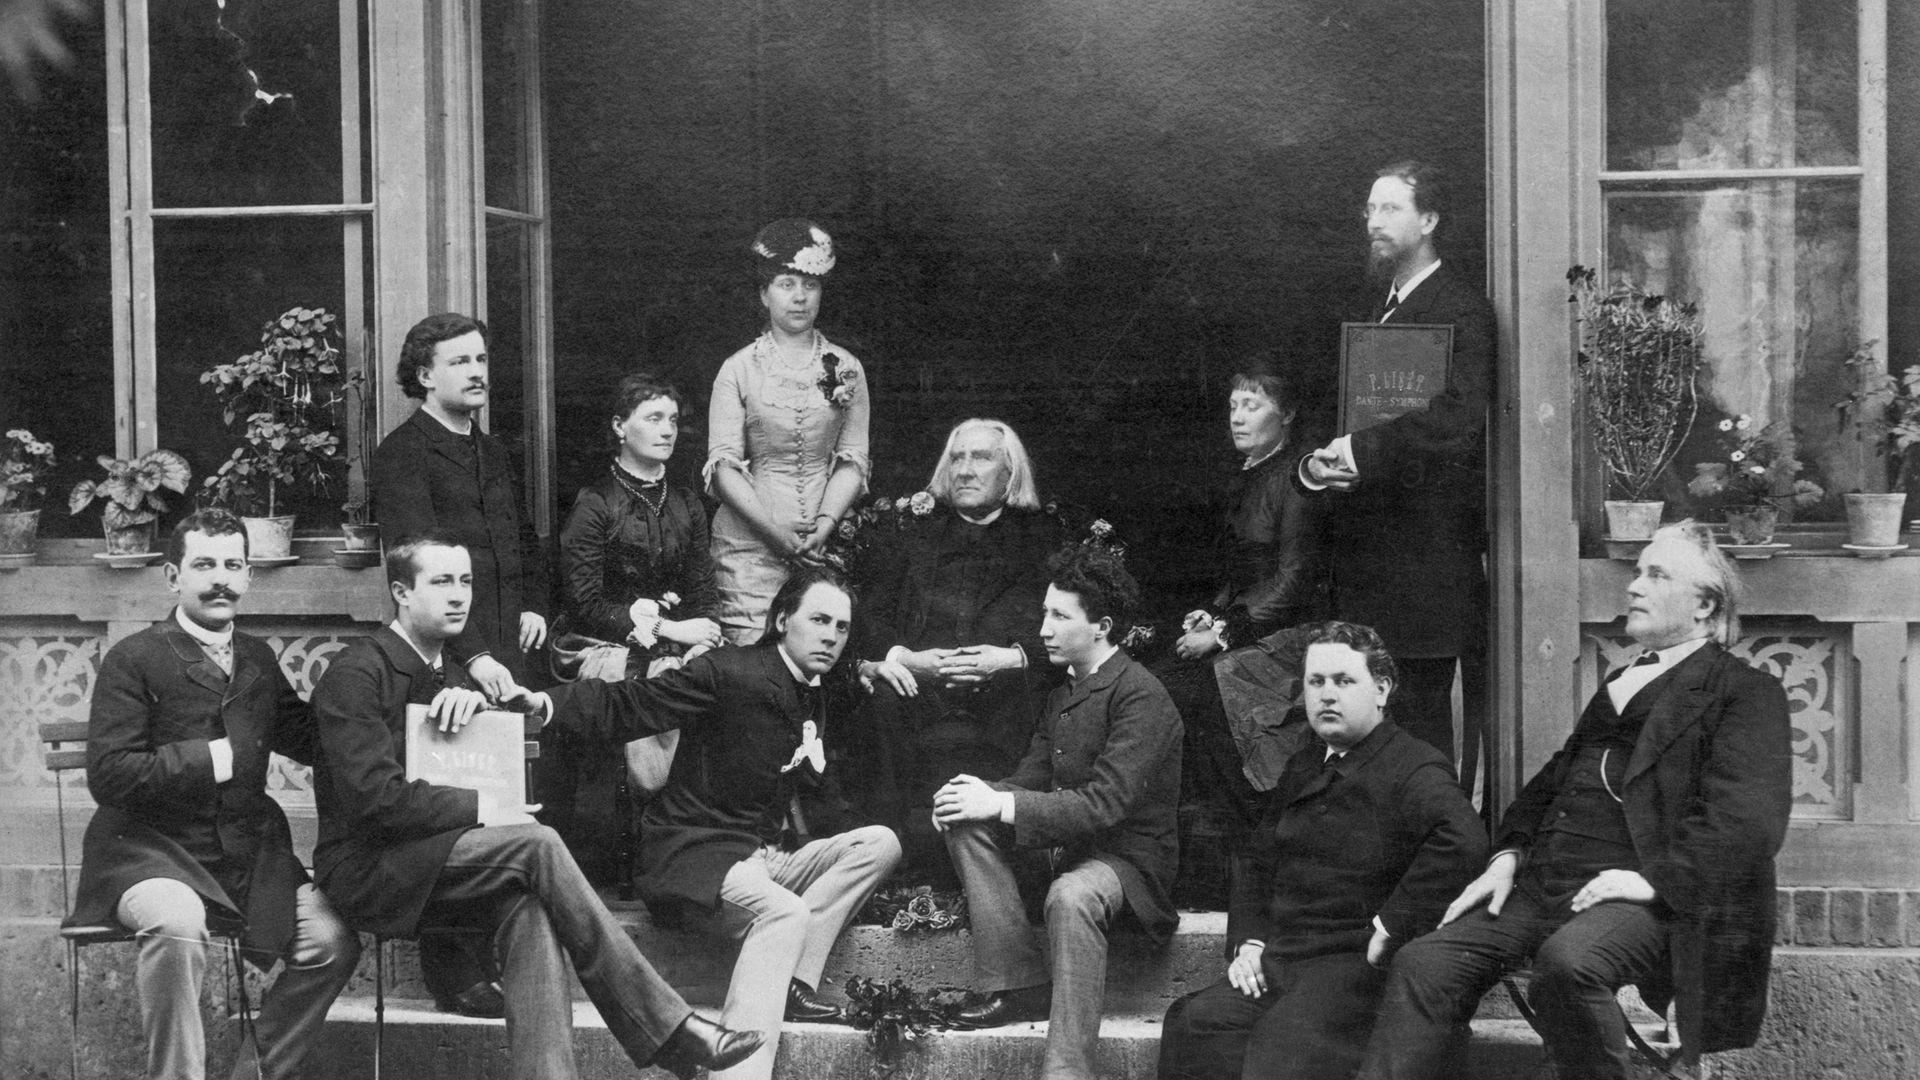 Franz Liszt among his pupils - Credit: Bettmann Archive